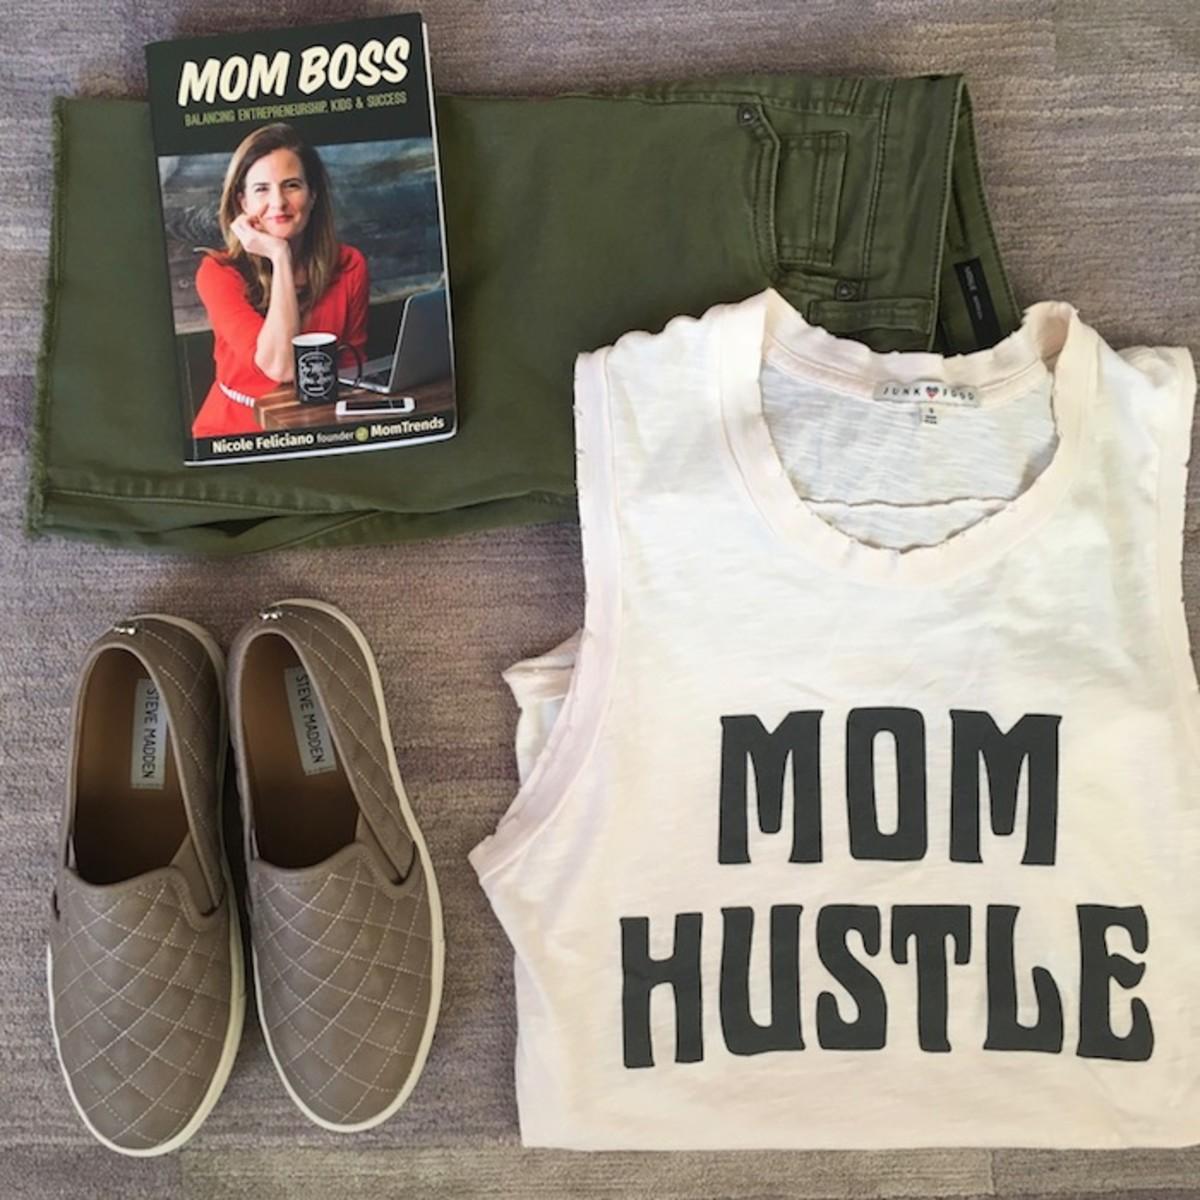 Mom Hustle T-shirt